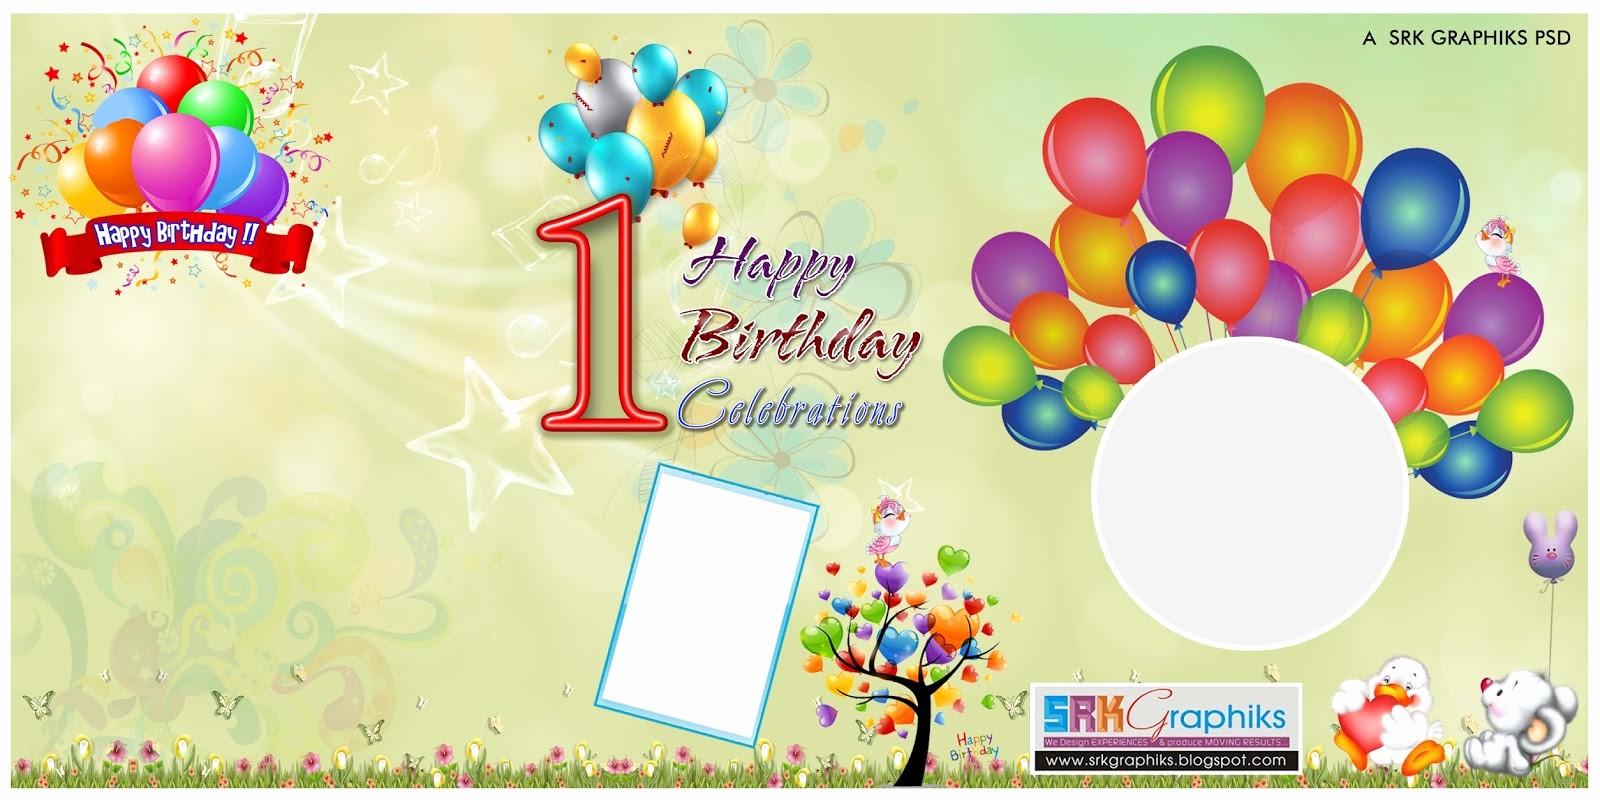 Birthday Banner Templates Free Download Awesome Birthday Invitation Templates Free Download